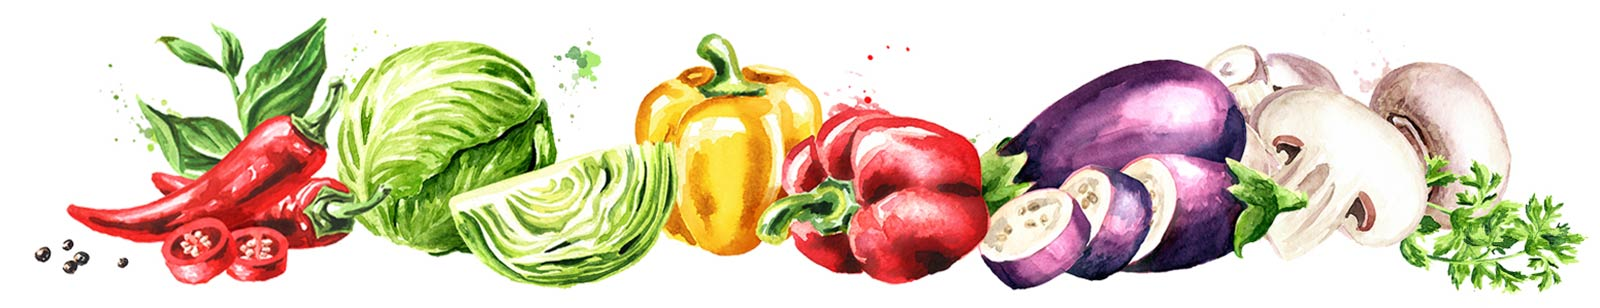 Vegetables from Menu Fresh